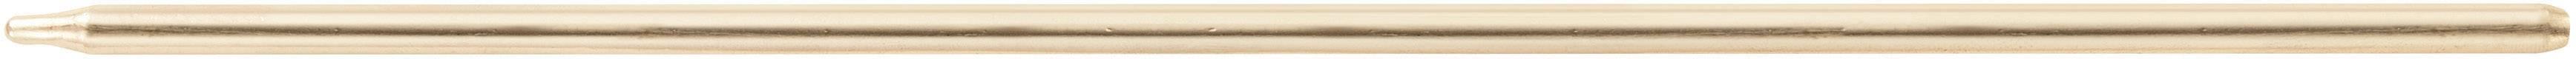 Teplovodná trubka Gelid CP-S6300-01, (Ø x d) 6 mm x 300 mm, měď, voda